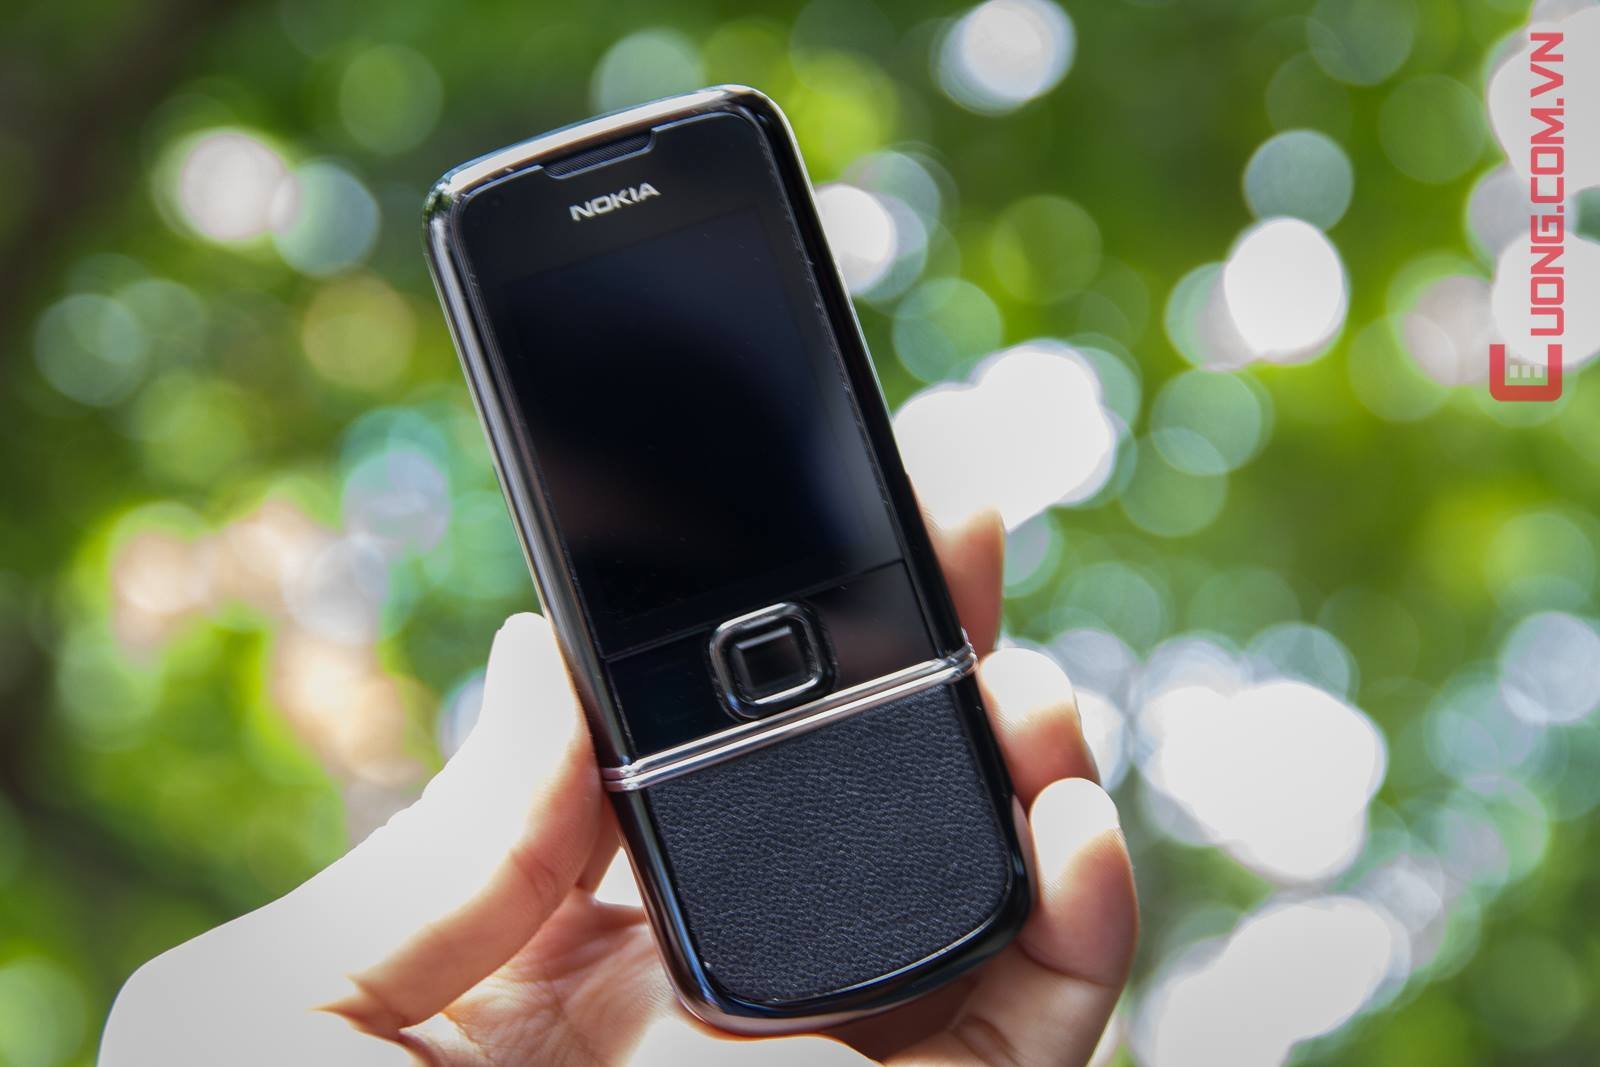 Nokia 8800 Black Arte thon g?n sang tr?ng